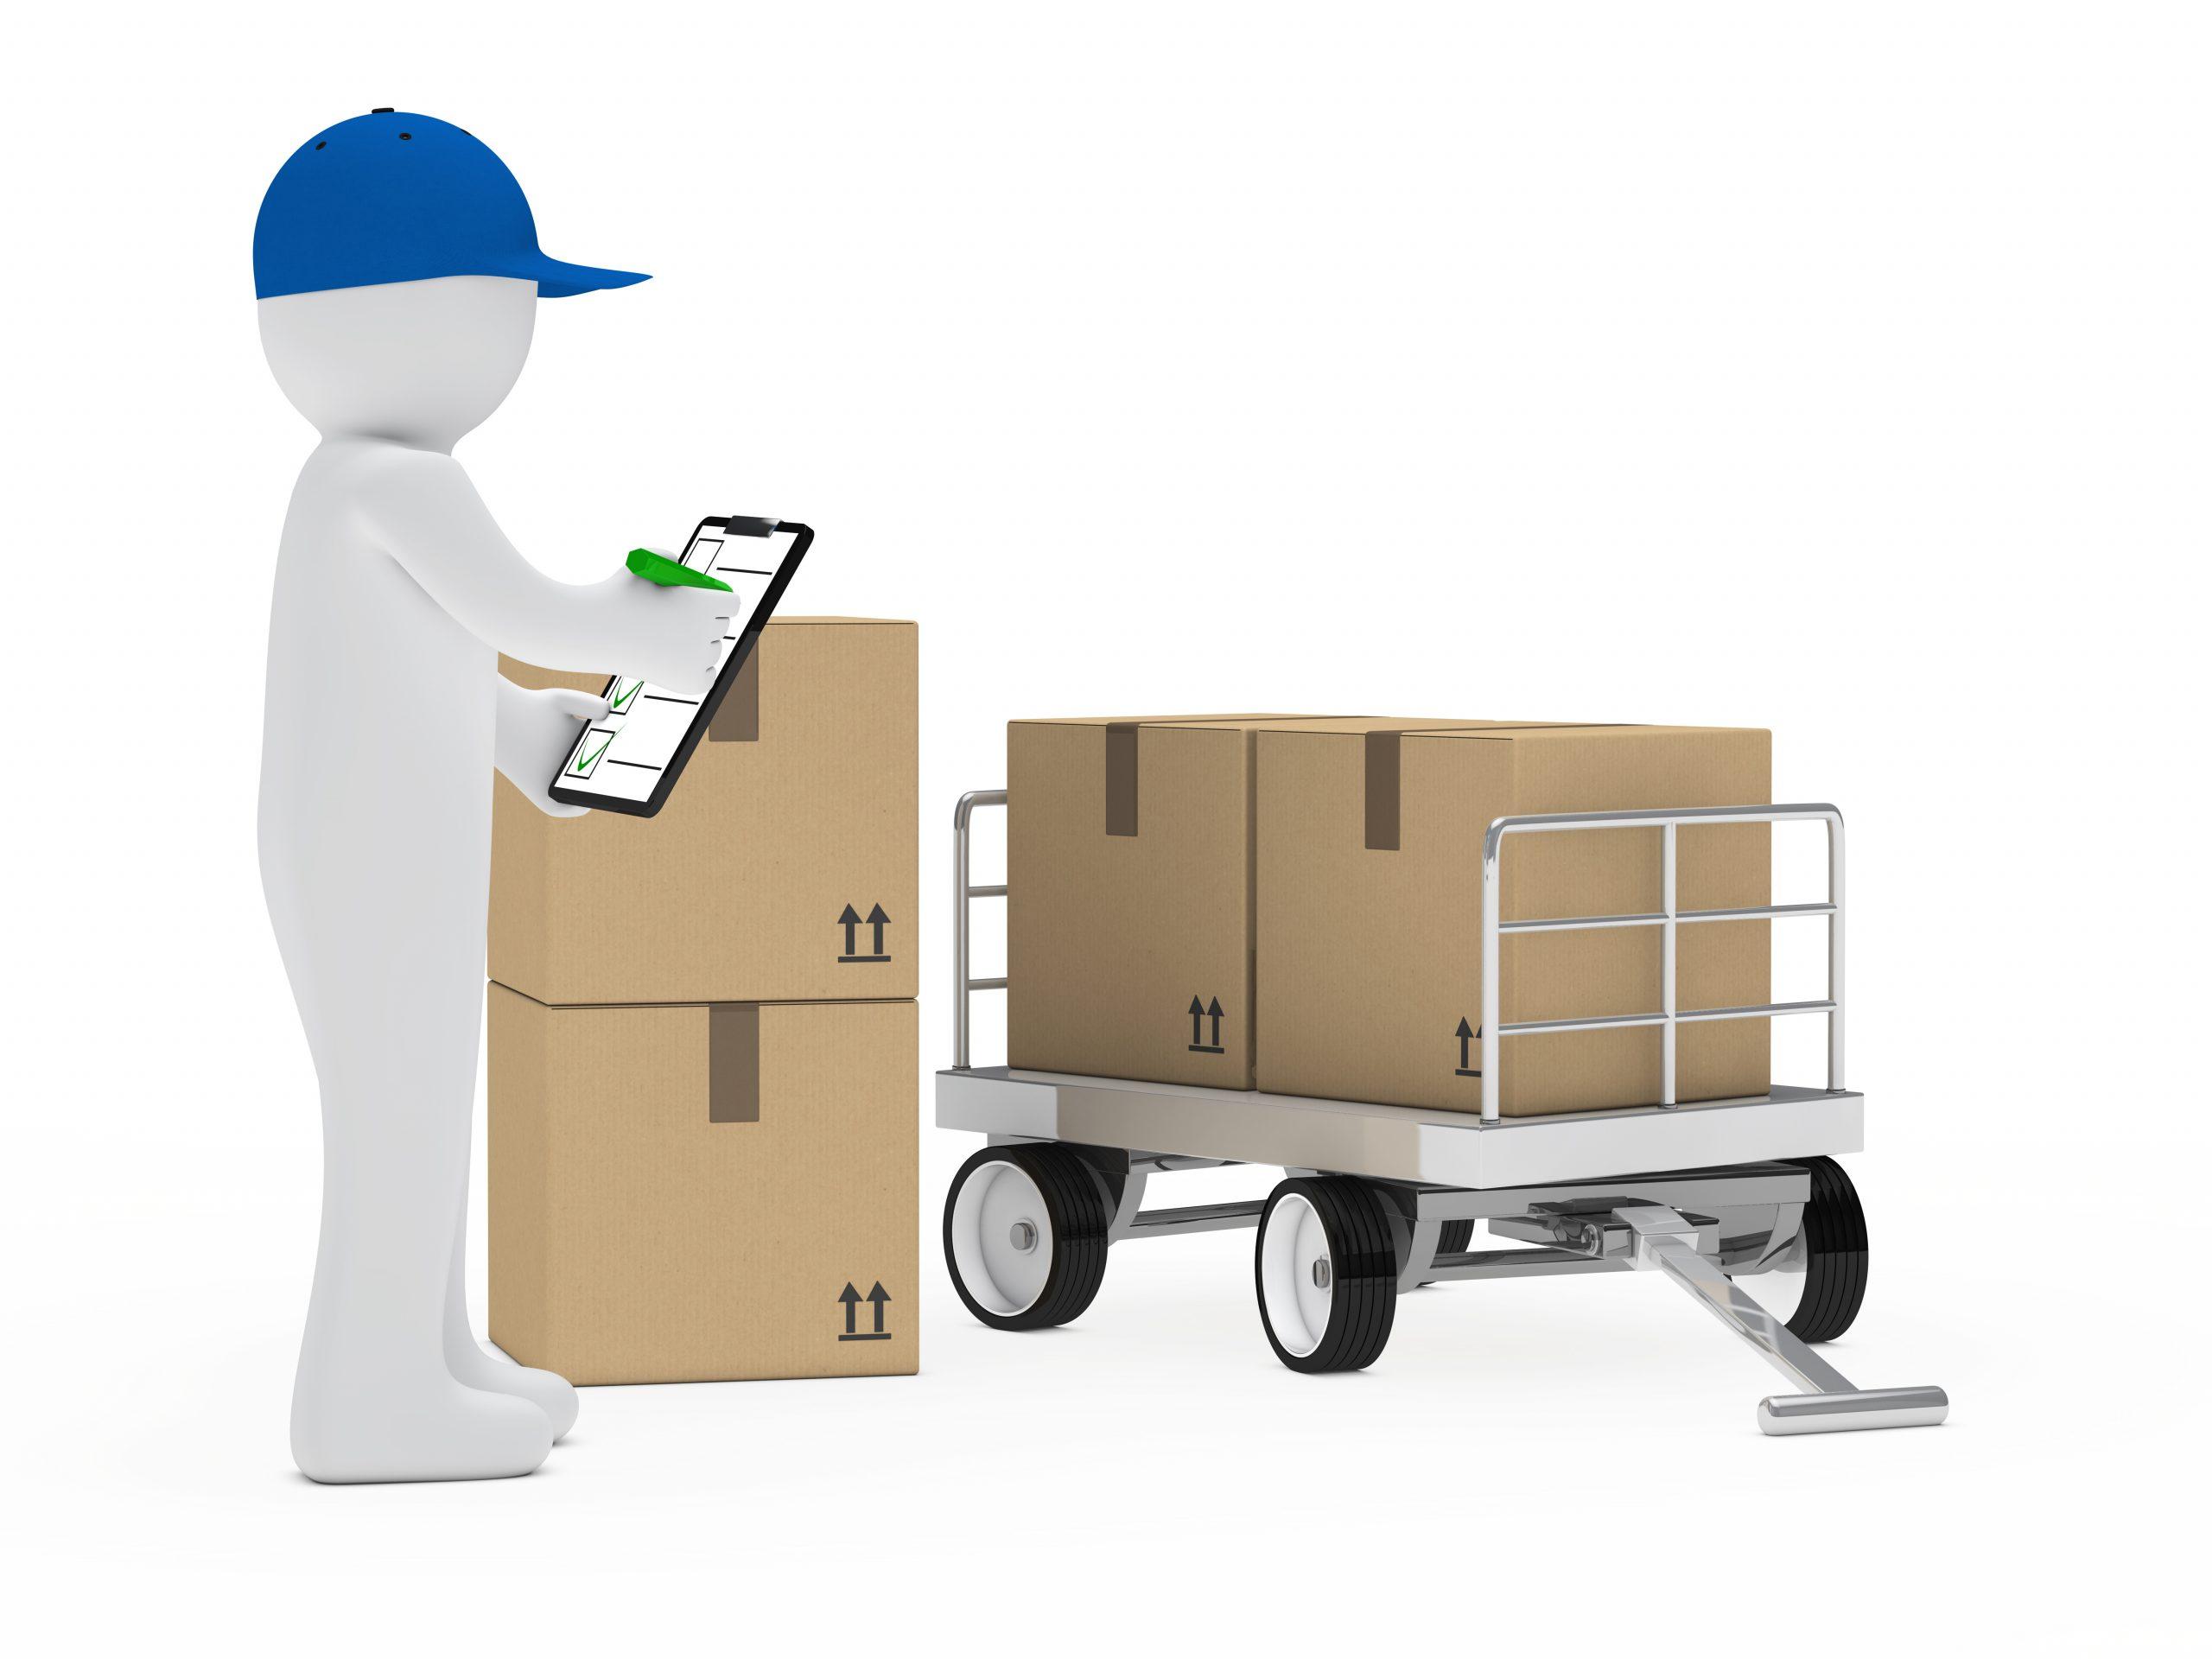 Amazon FBA Business Checklist